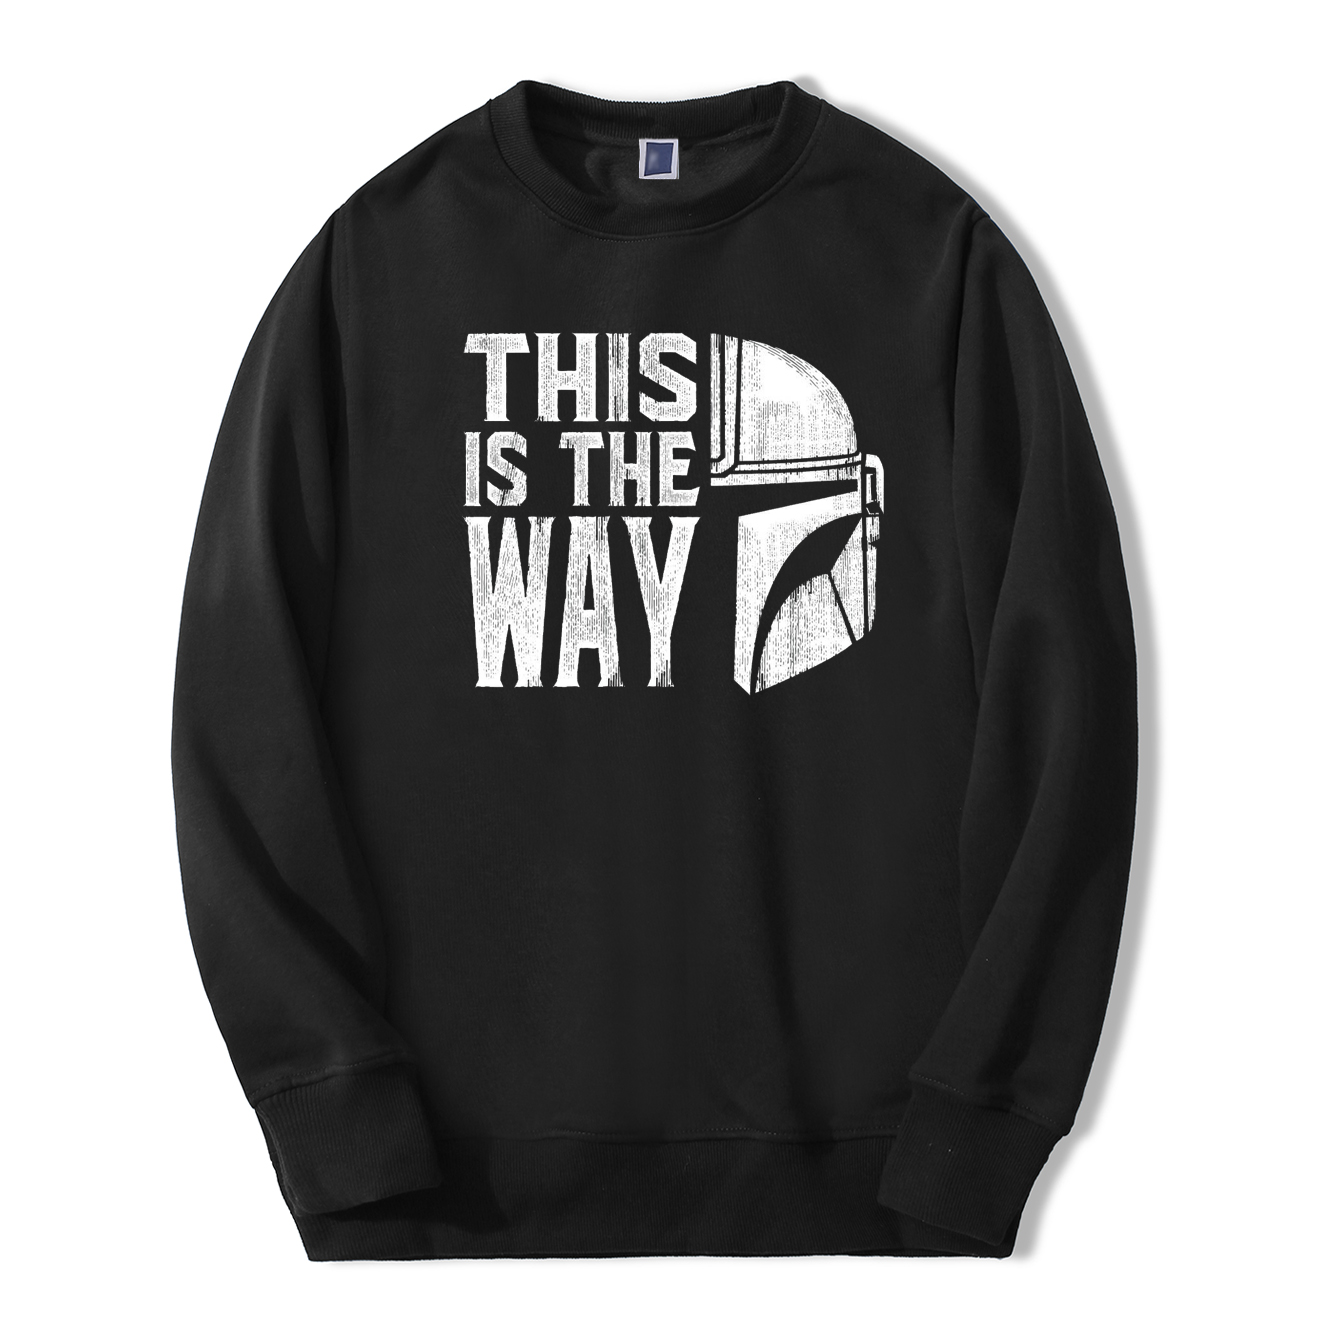 TV Show Mandalorian Way Men Sweatshirt Hoodies 2020 Spring Autumn Star Wars Streetwear Hip Hop Fashoin This Is My Way Pullover